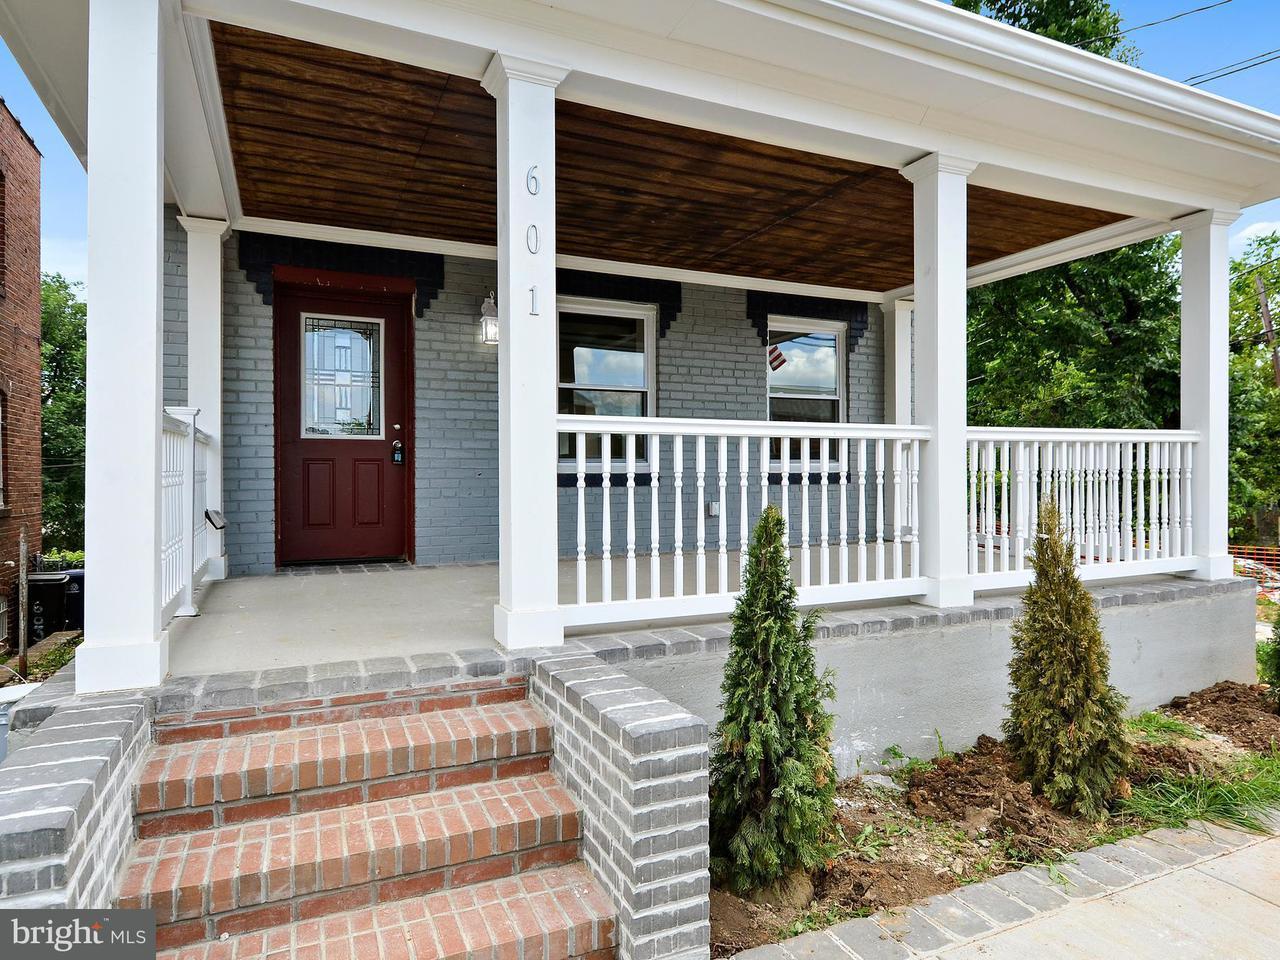 Single Family Home for Sale at 601 Atlantic St Se 601 Atlantic St Se Washington, District Of Columbia 20032 United States